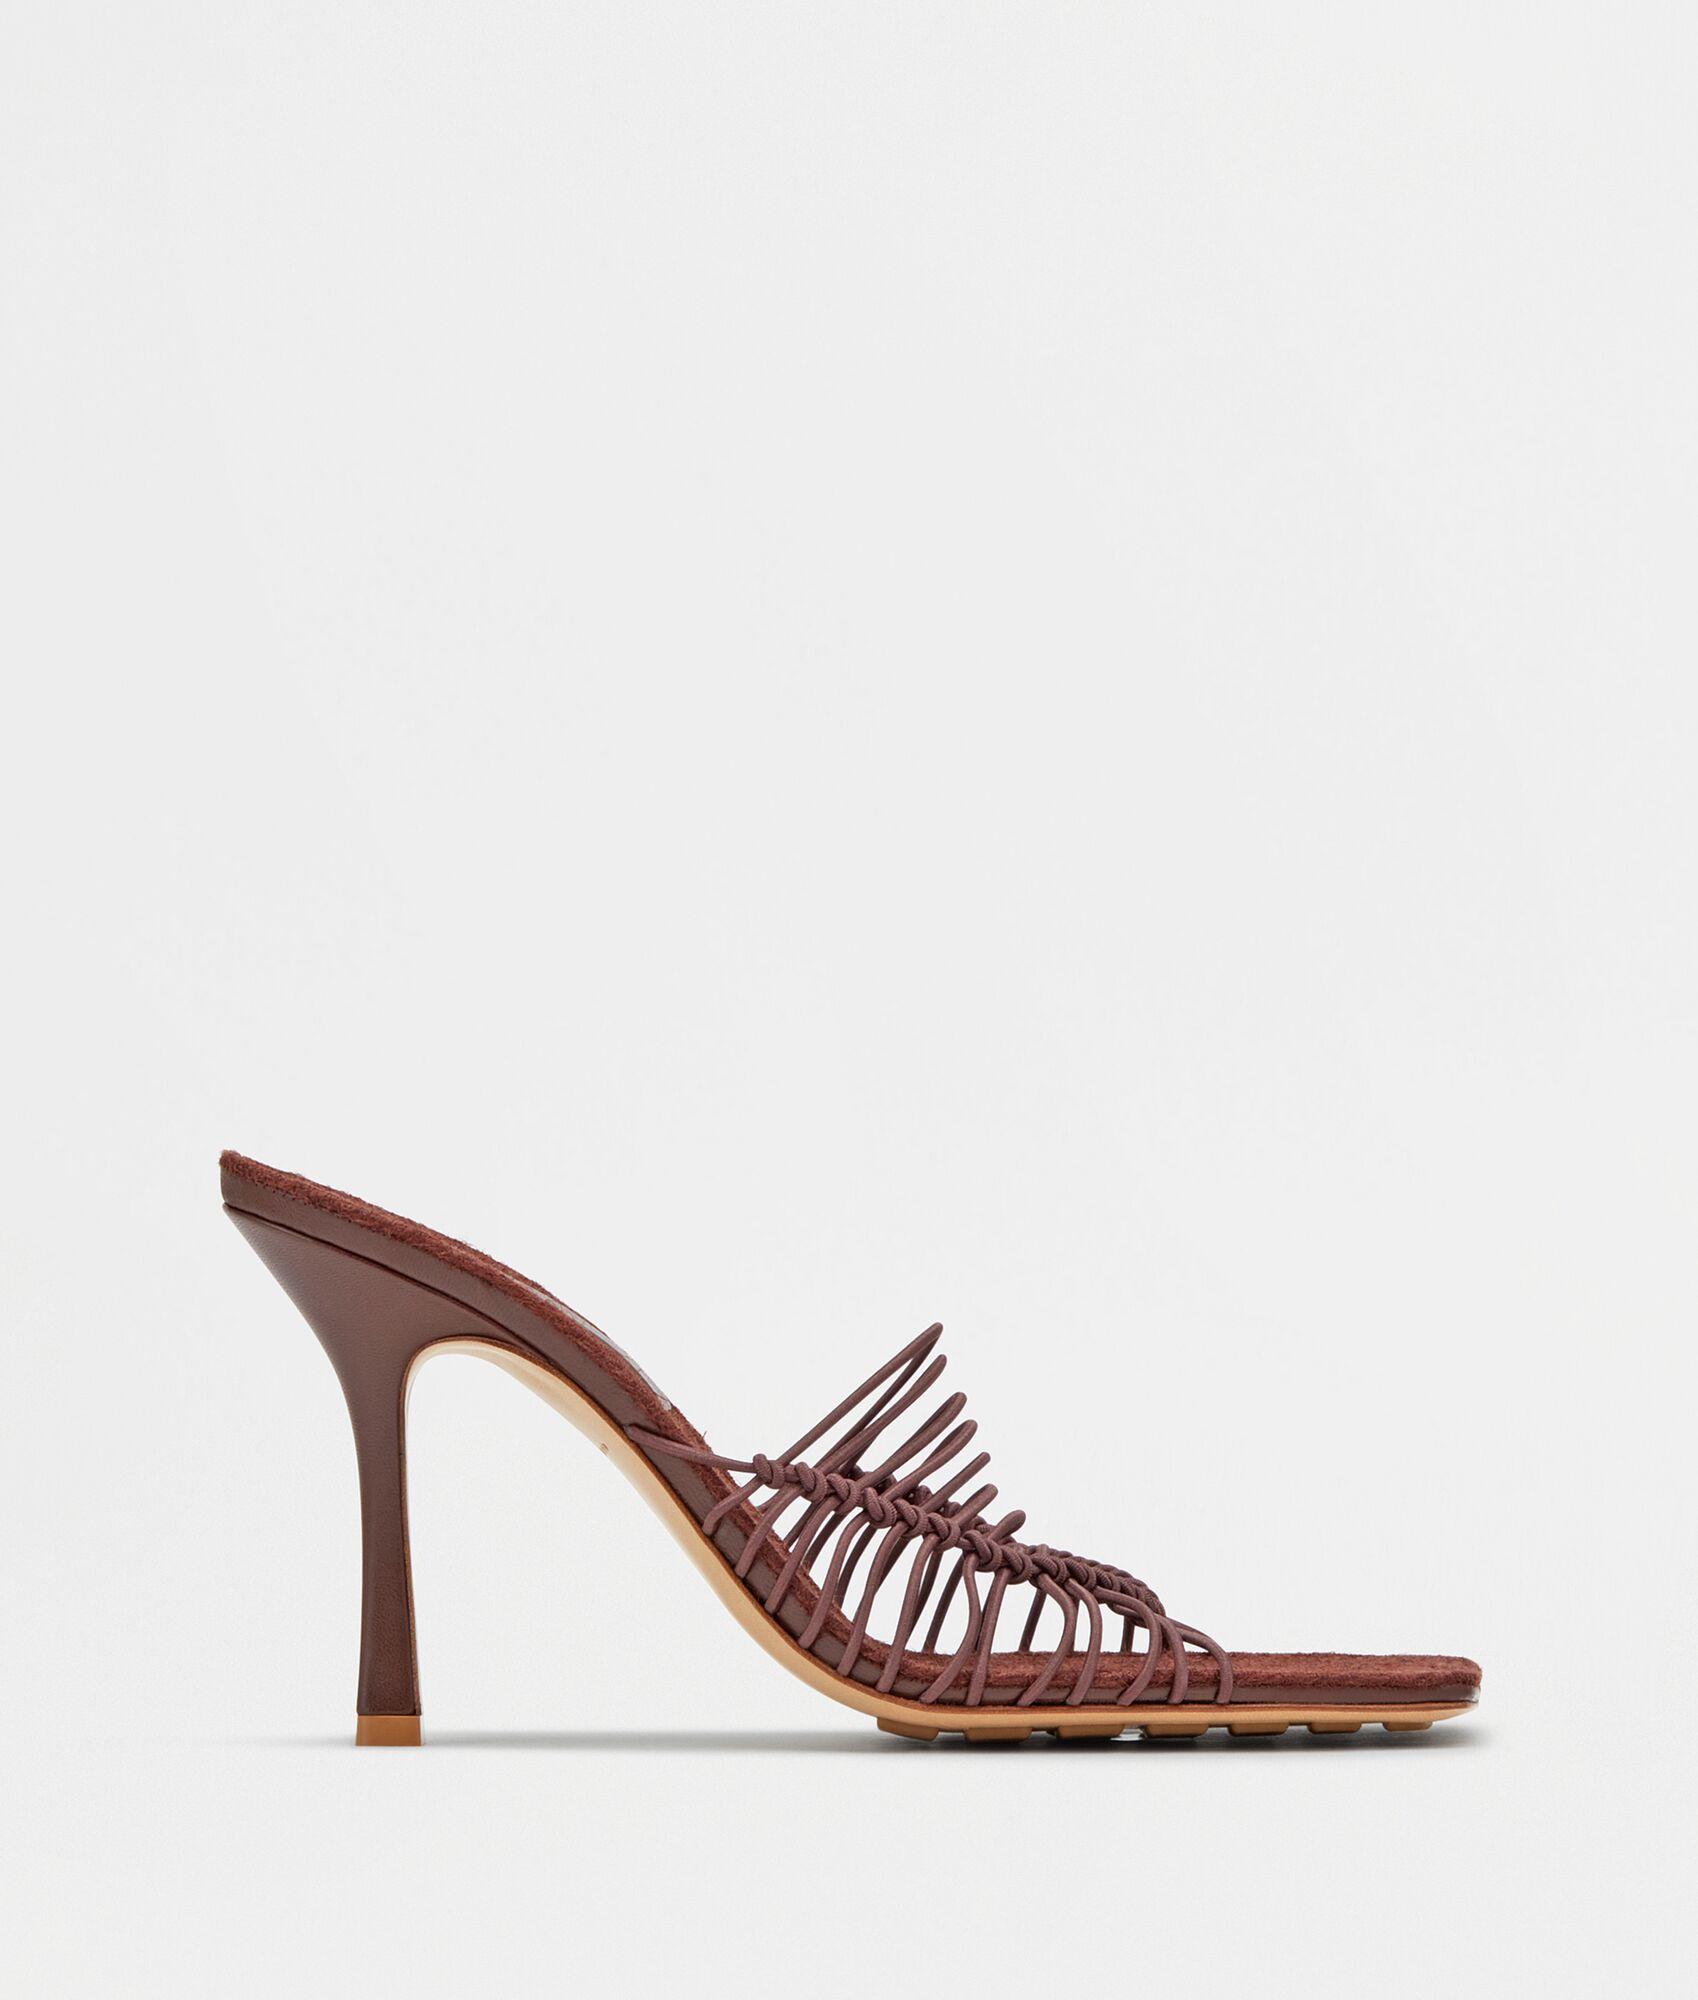 Bottega Stretch Sandale 690 Euro